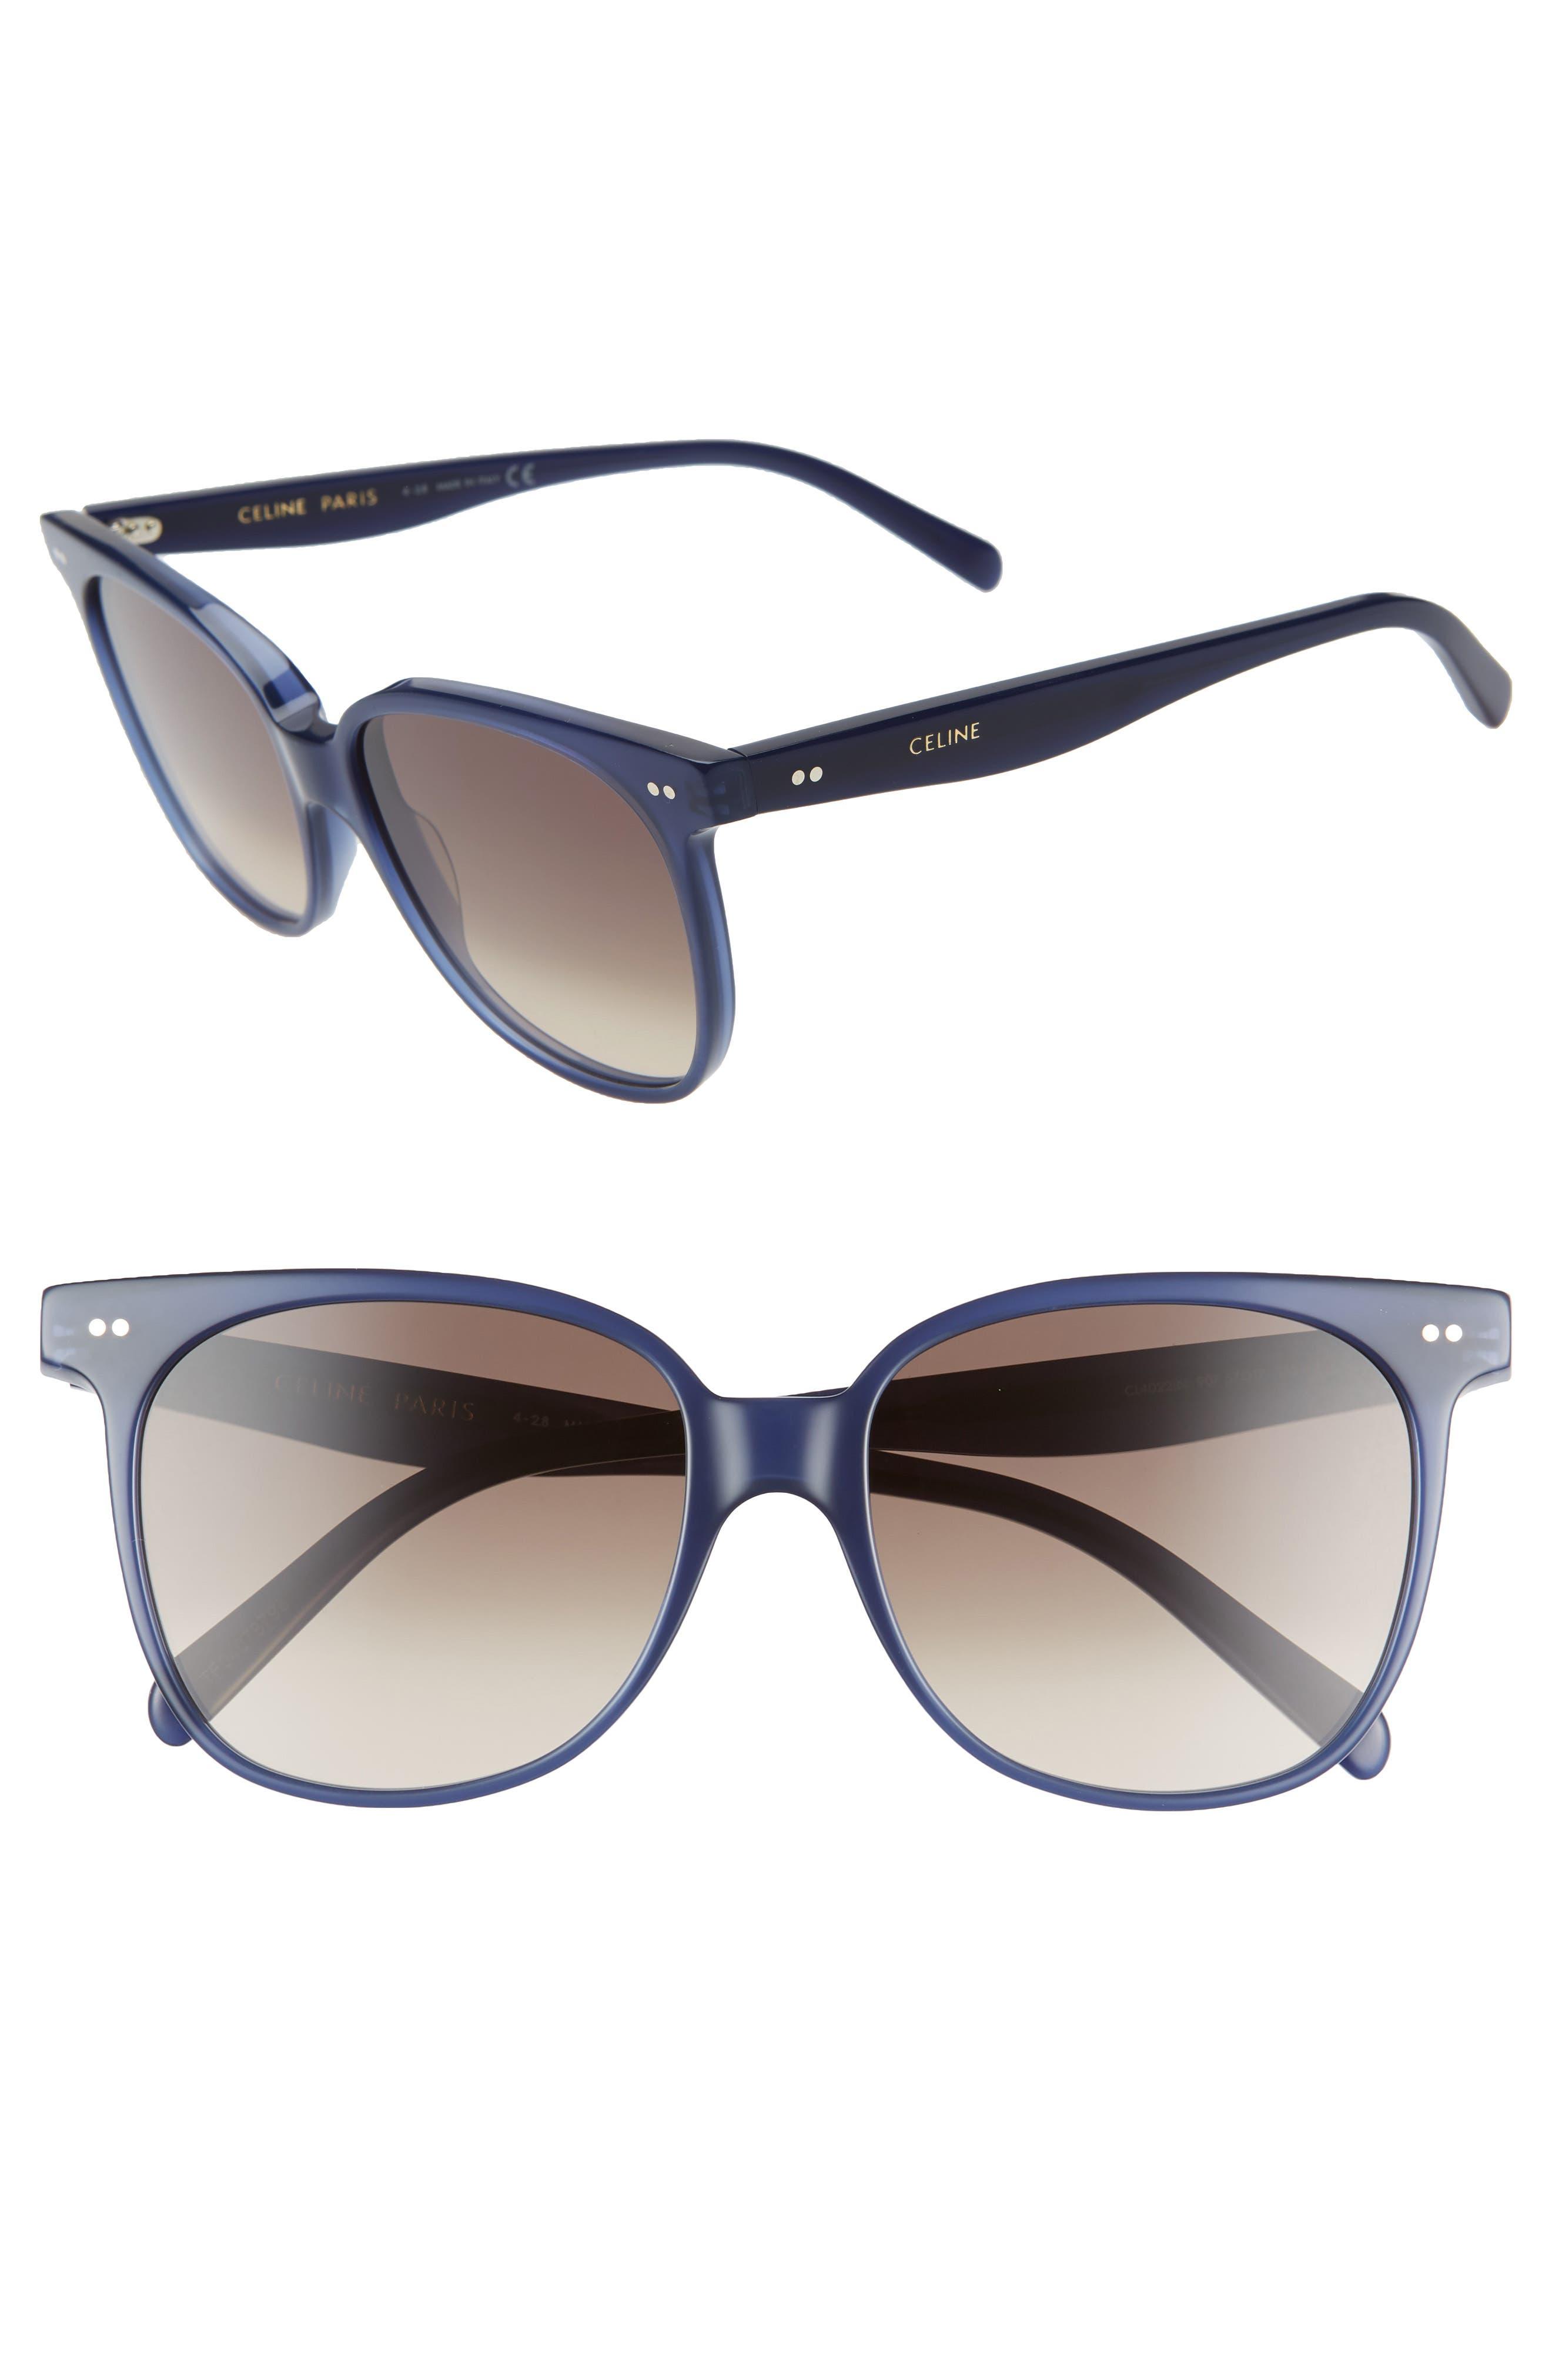 57mm Round Sunglasses,                             Main thumbnail 1, color,                             BLUE/ BROWN GRADIENT